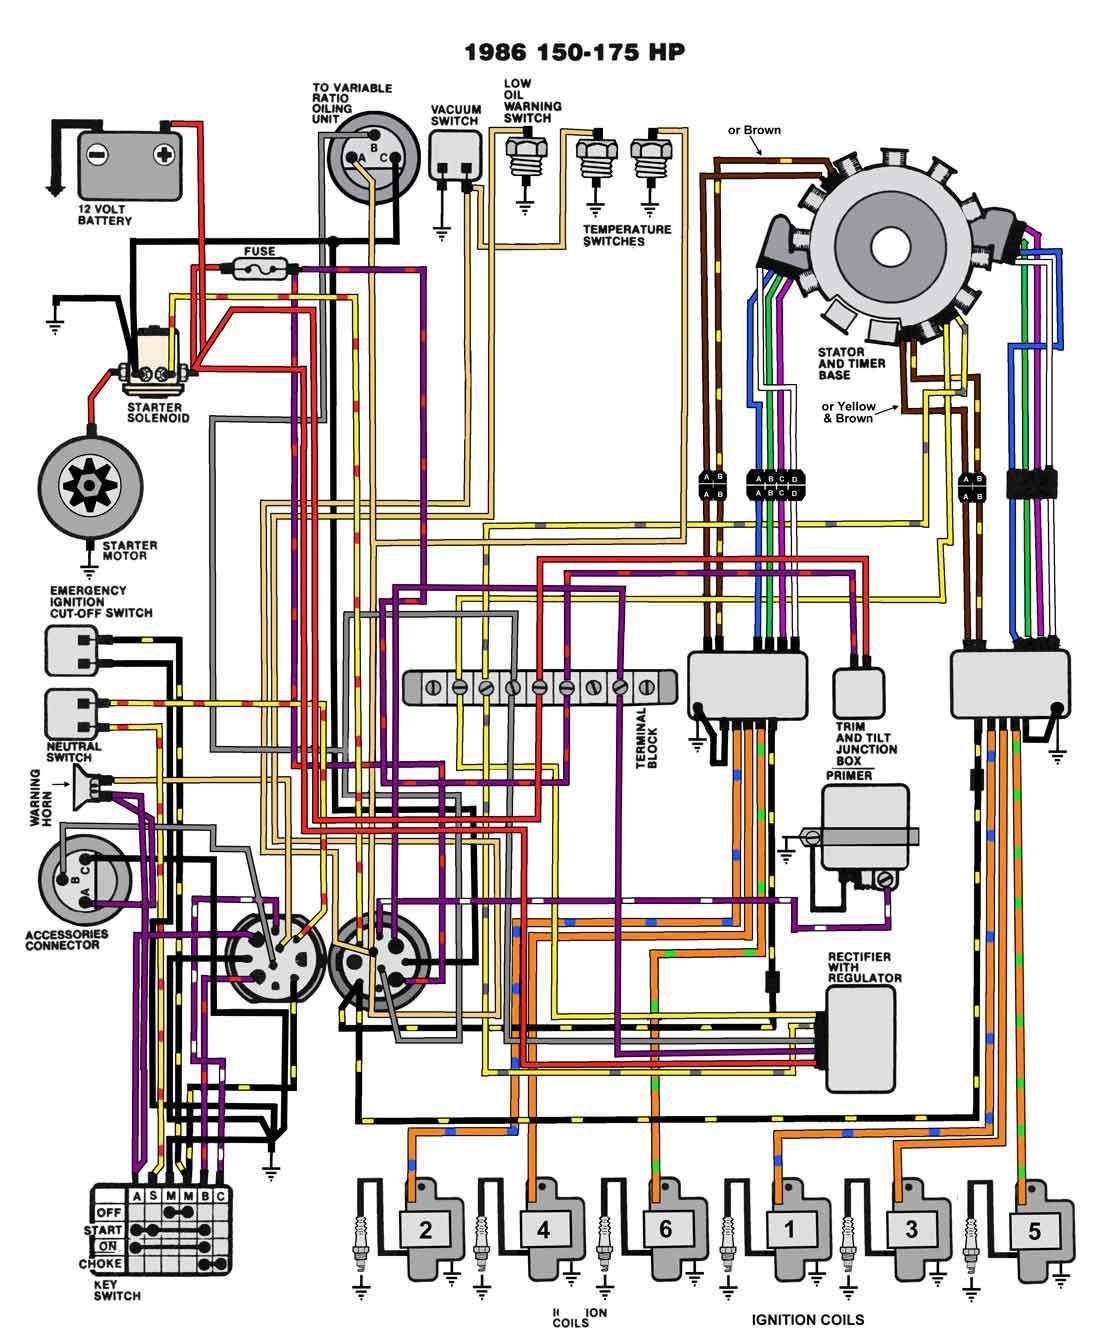 1973 115 johnson wiring diagram schematic nk 1458  wiring diagram also 15 hp johnson outboard fuel pump  hp johnson outboard fuel pump